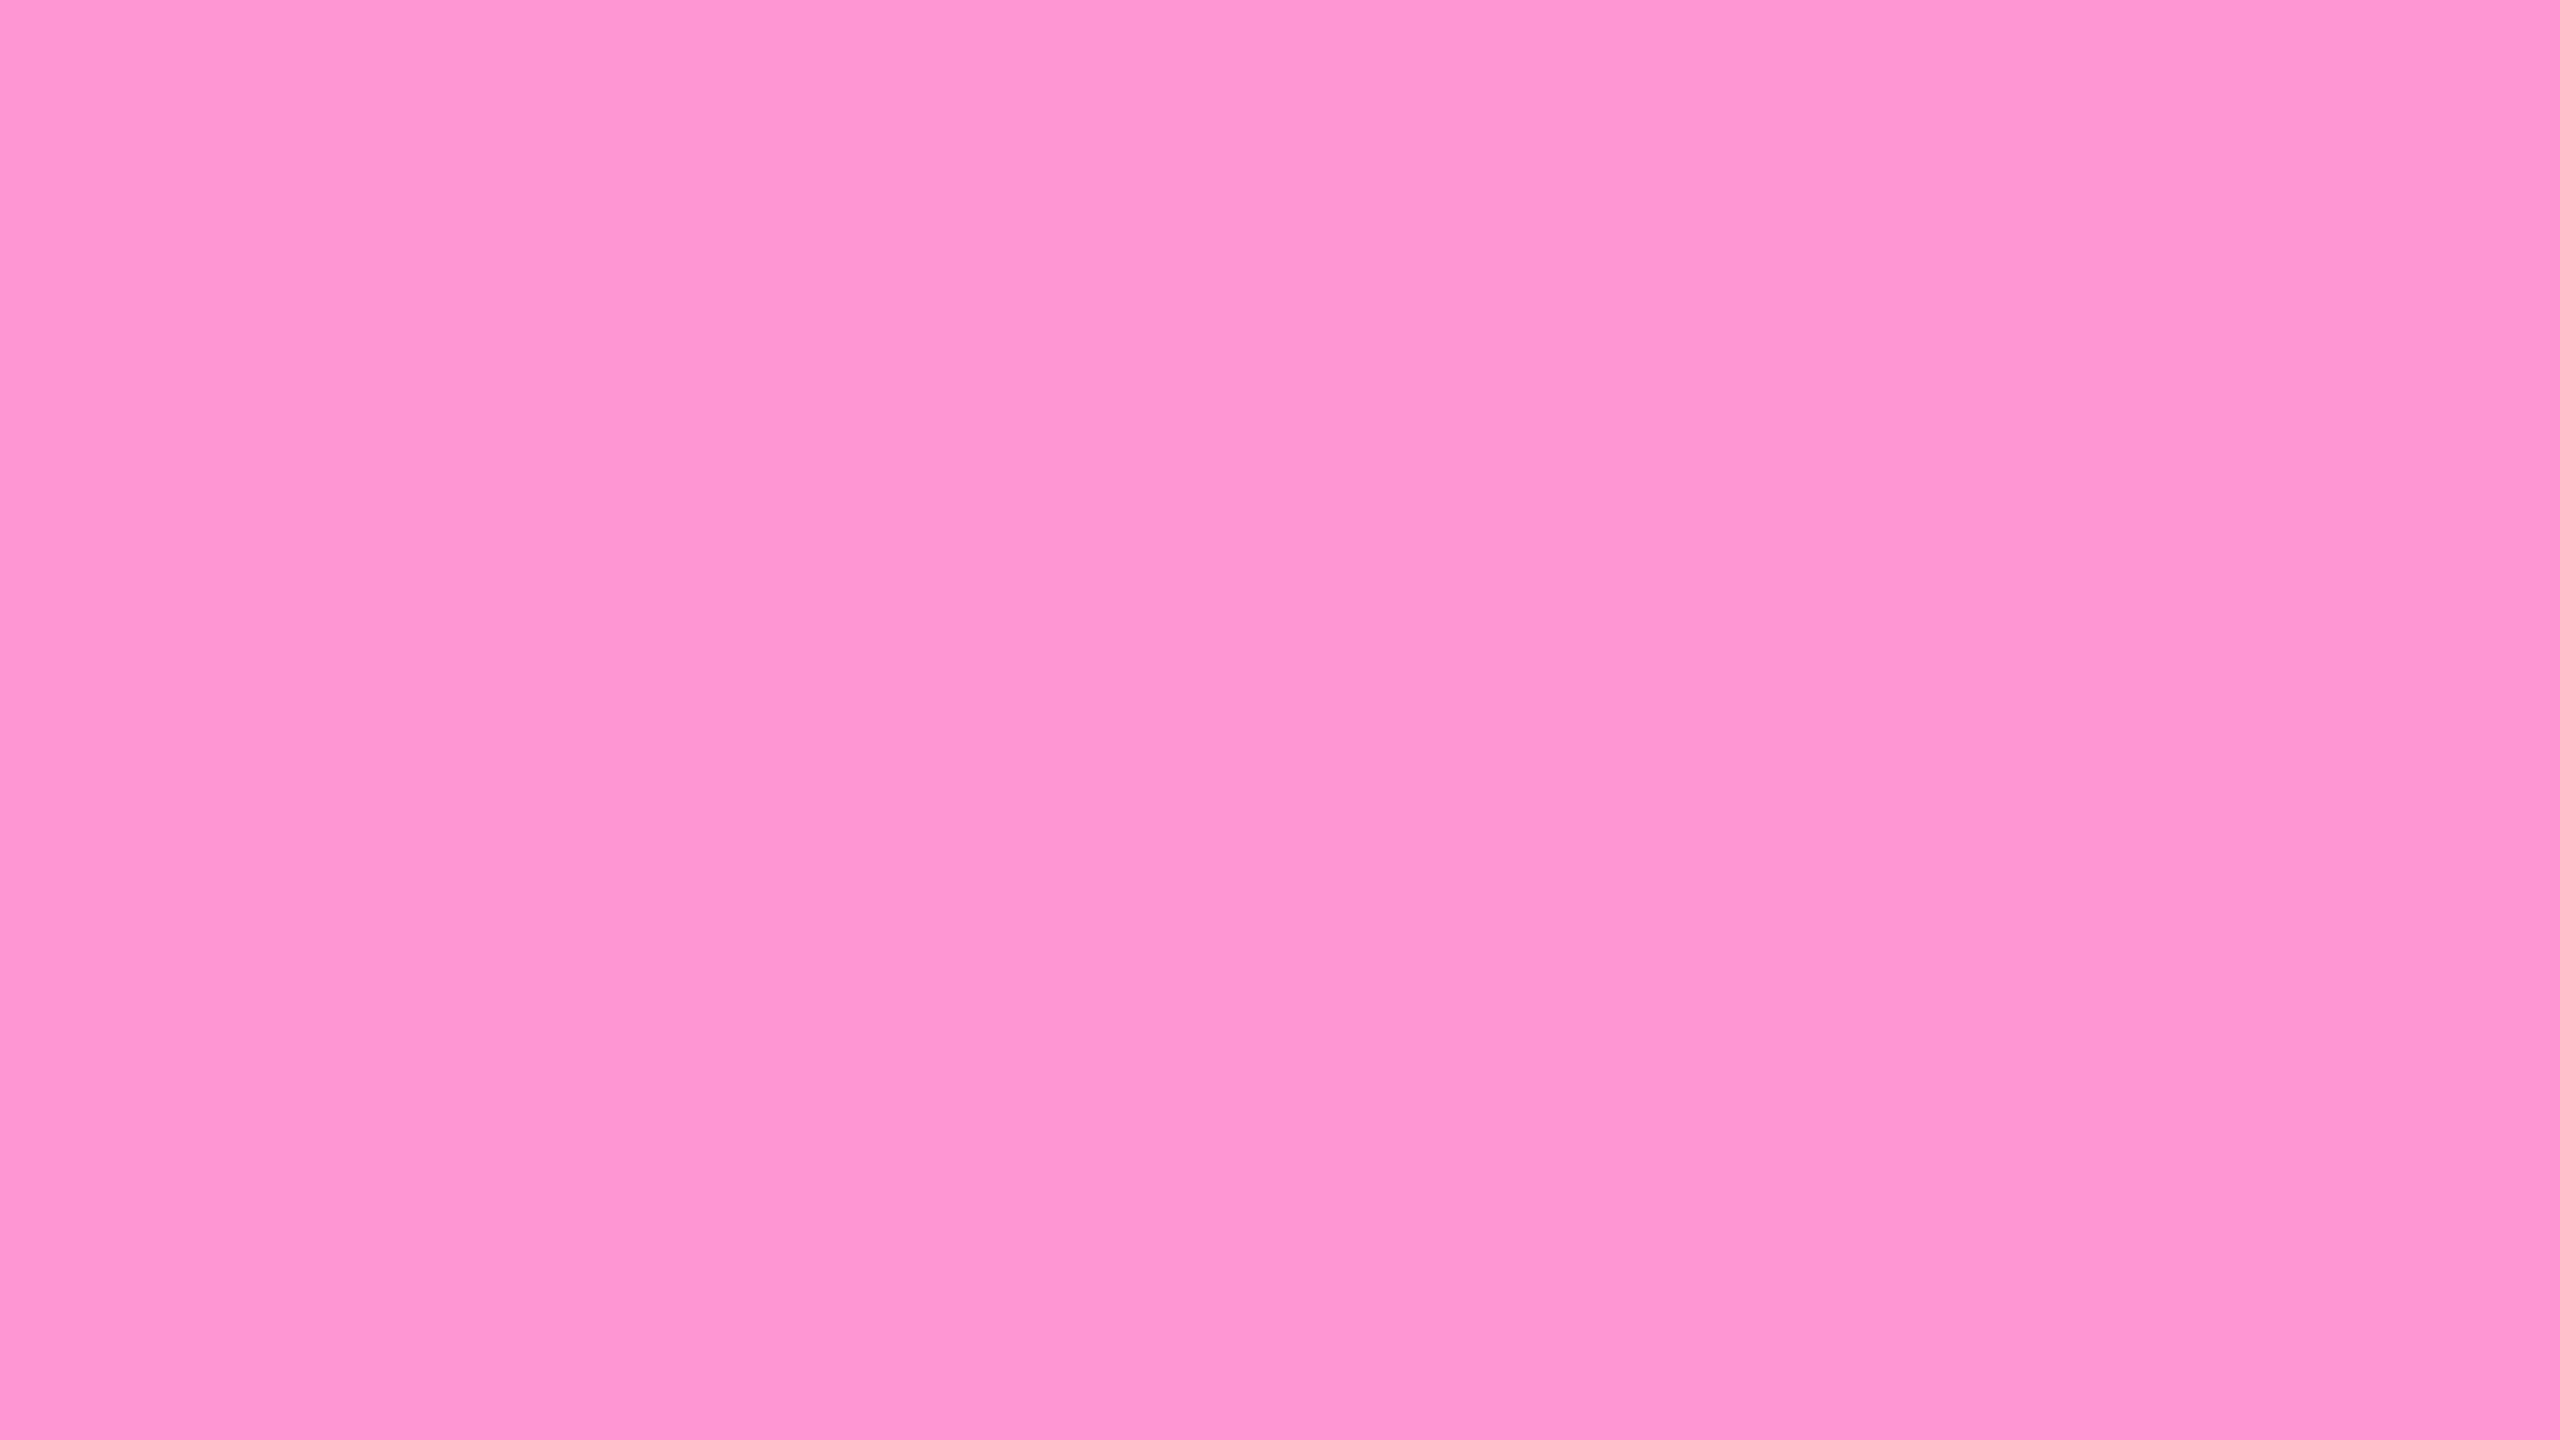 Light Pink At Light Pink Girly Wallpaper.